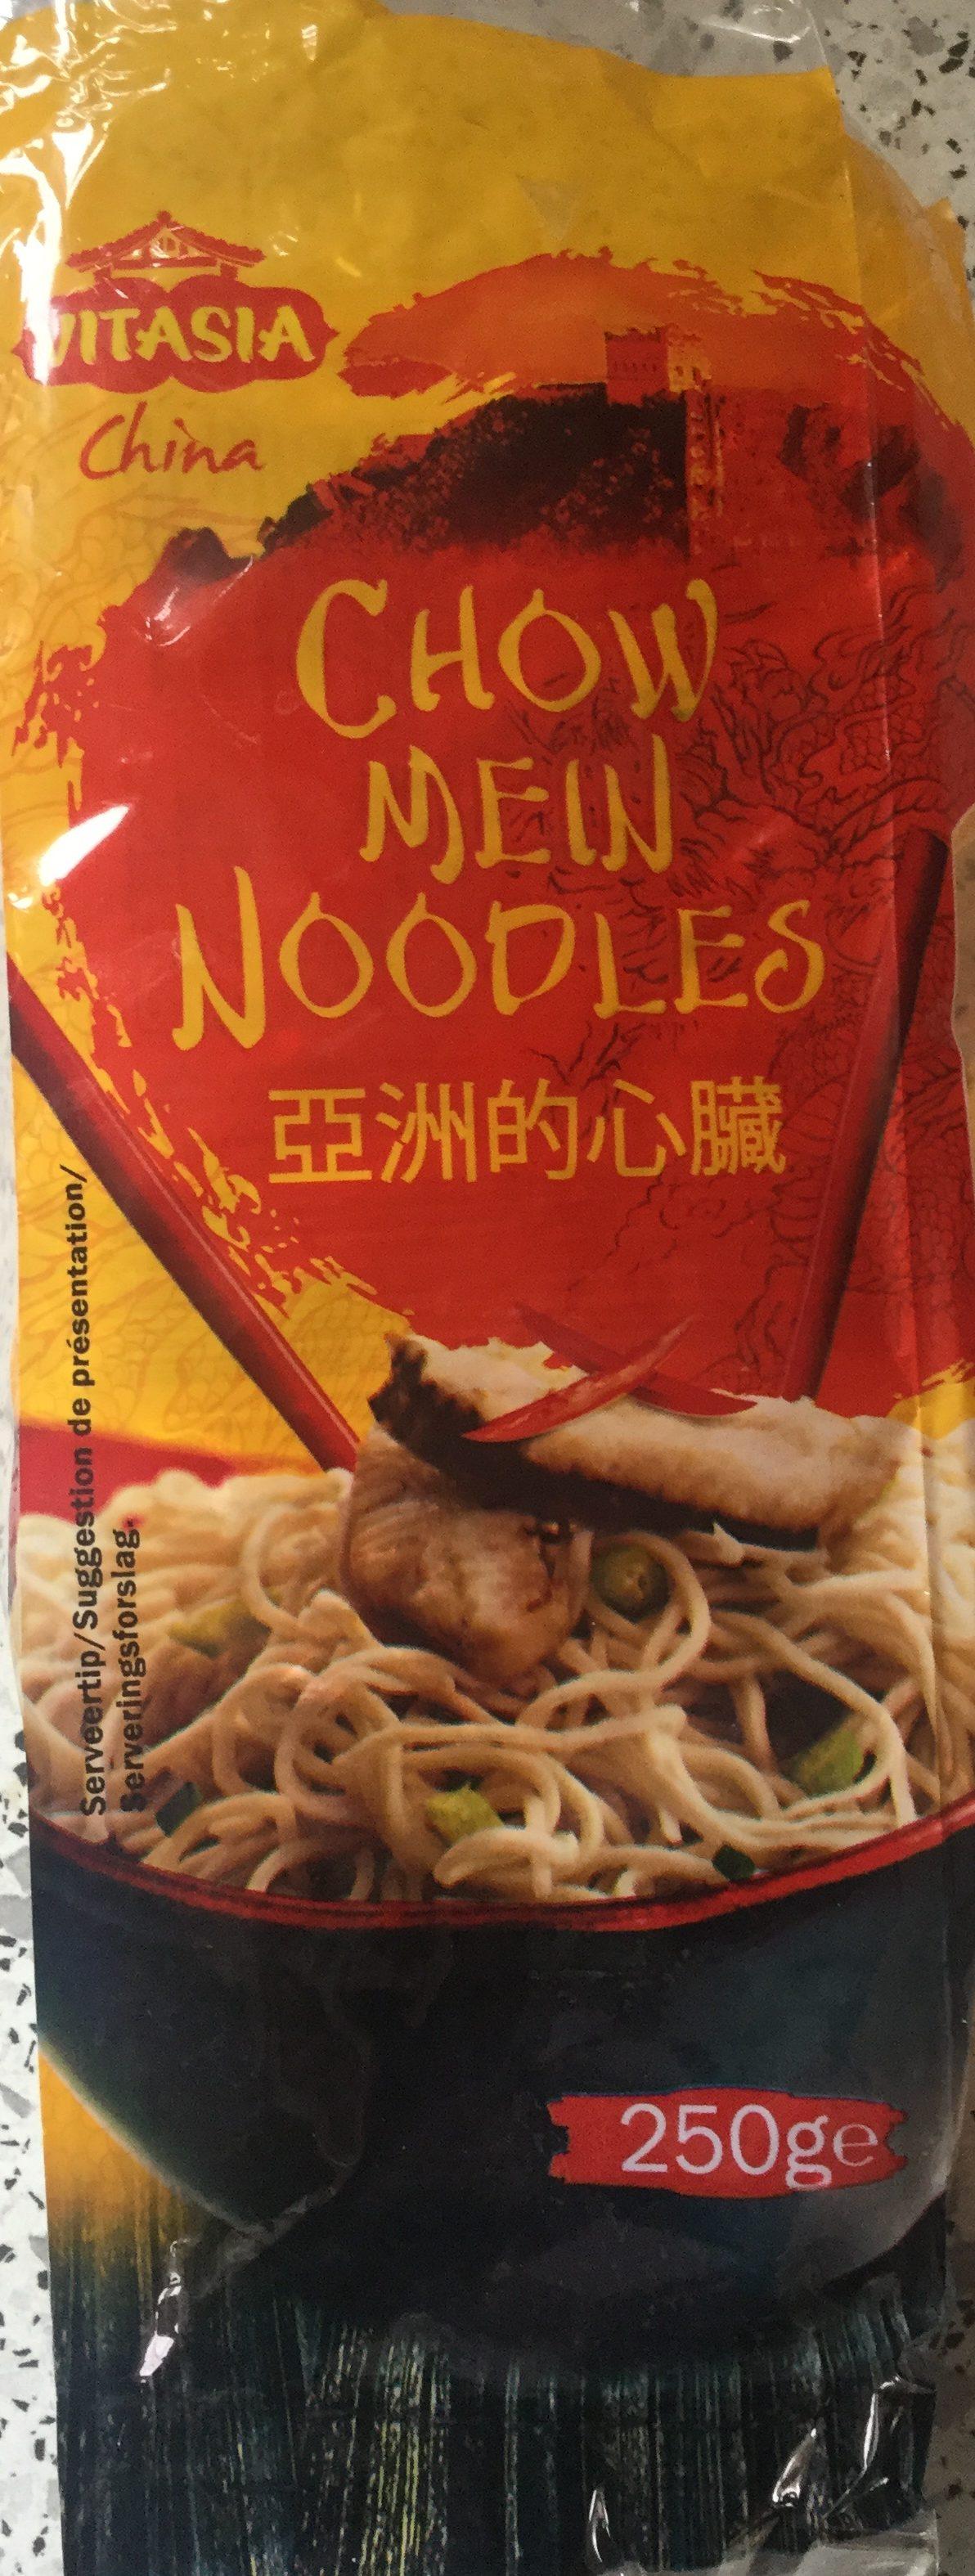 Chow Mein Noodles - Produkt